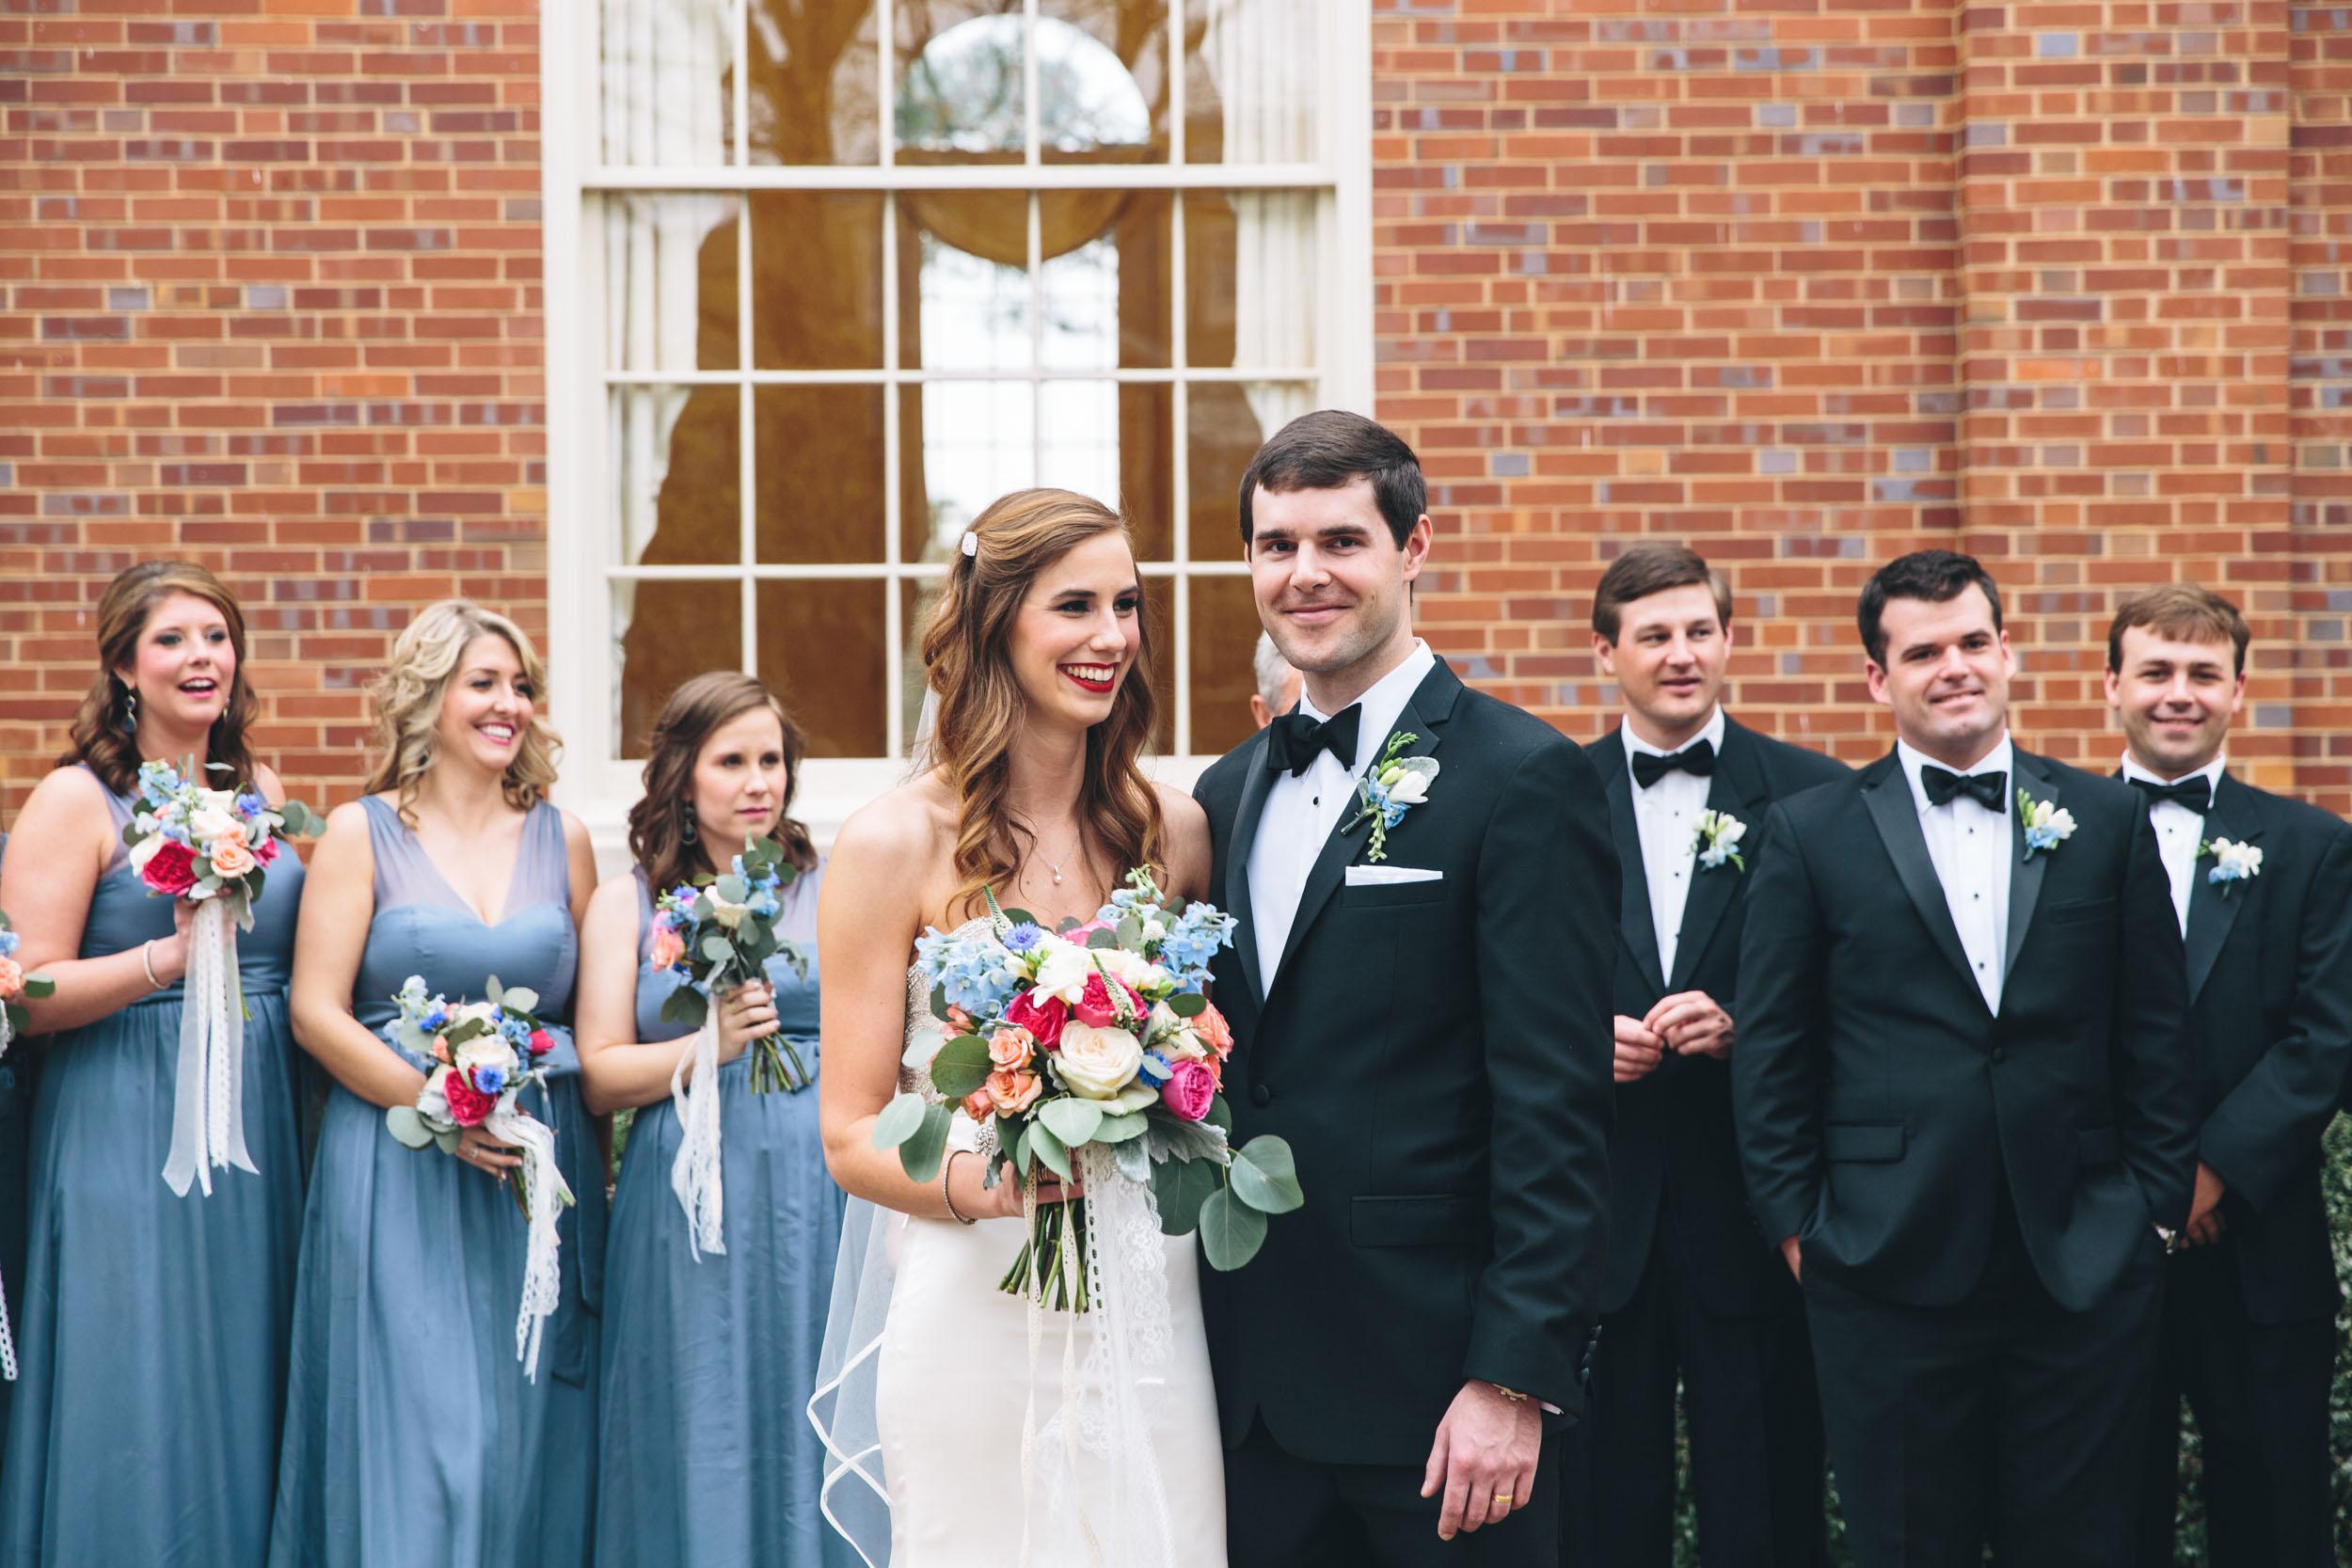 jimmy-rowalt-atlanta-wedding-photography-086.jpg